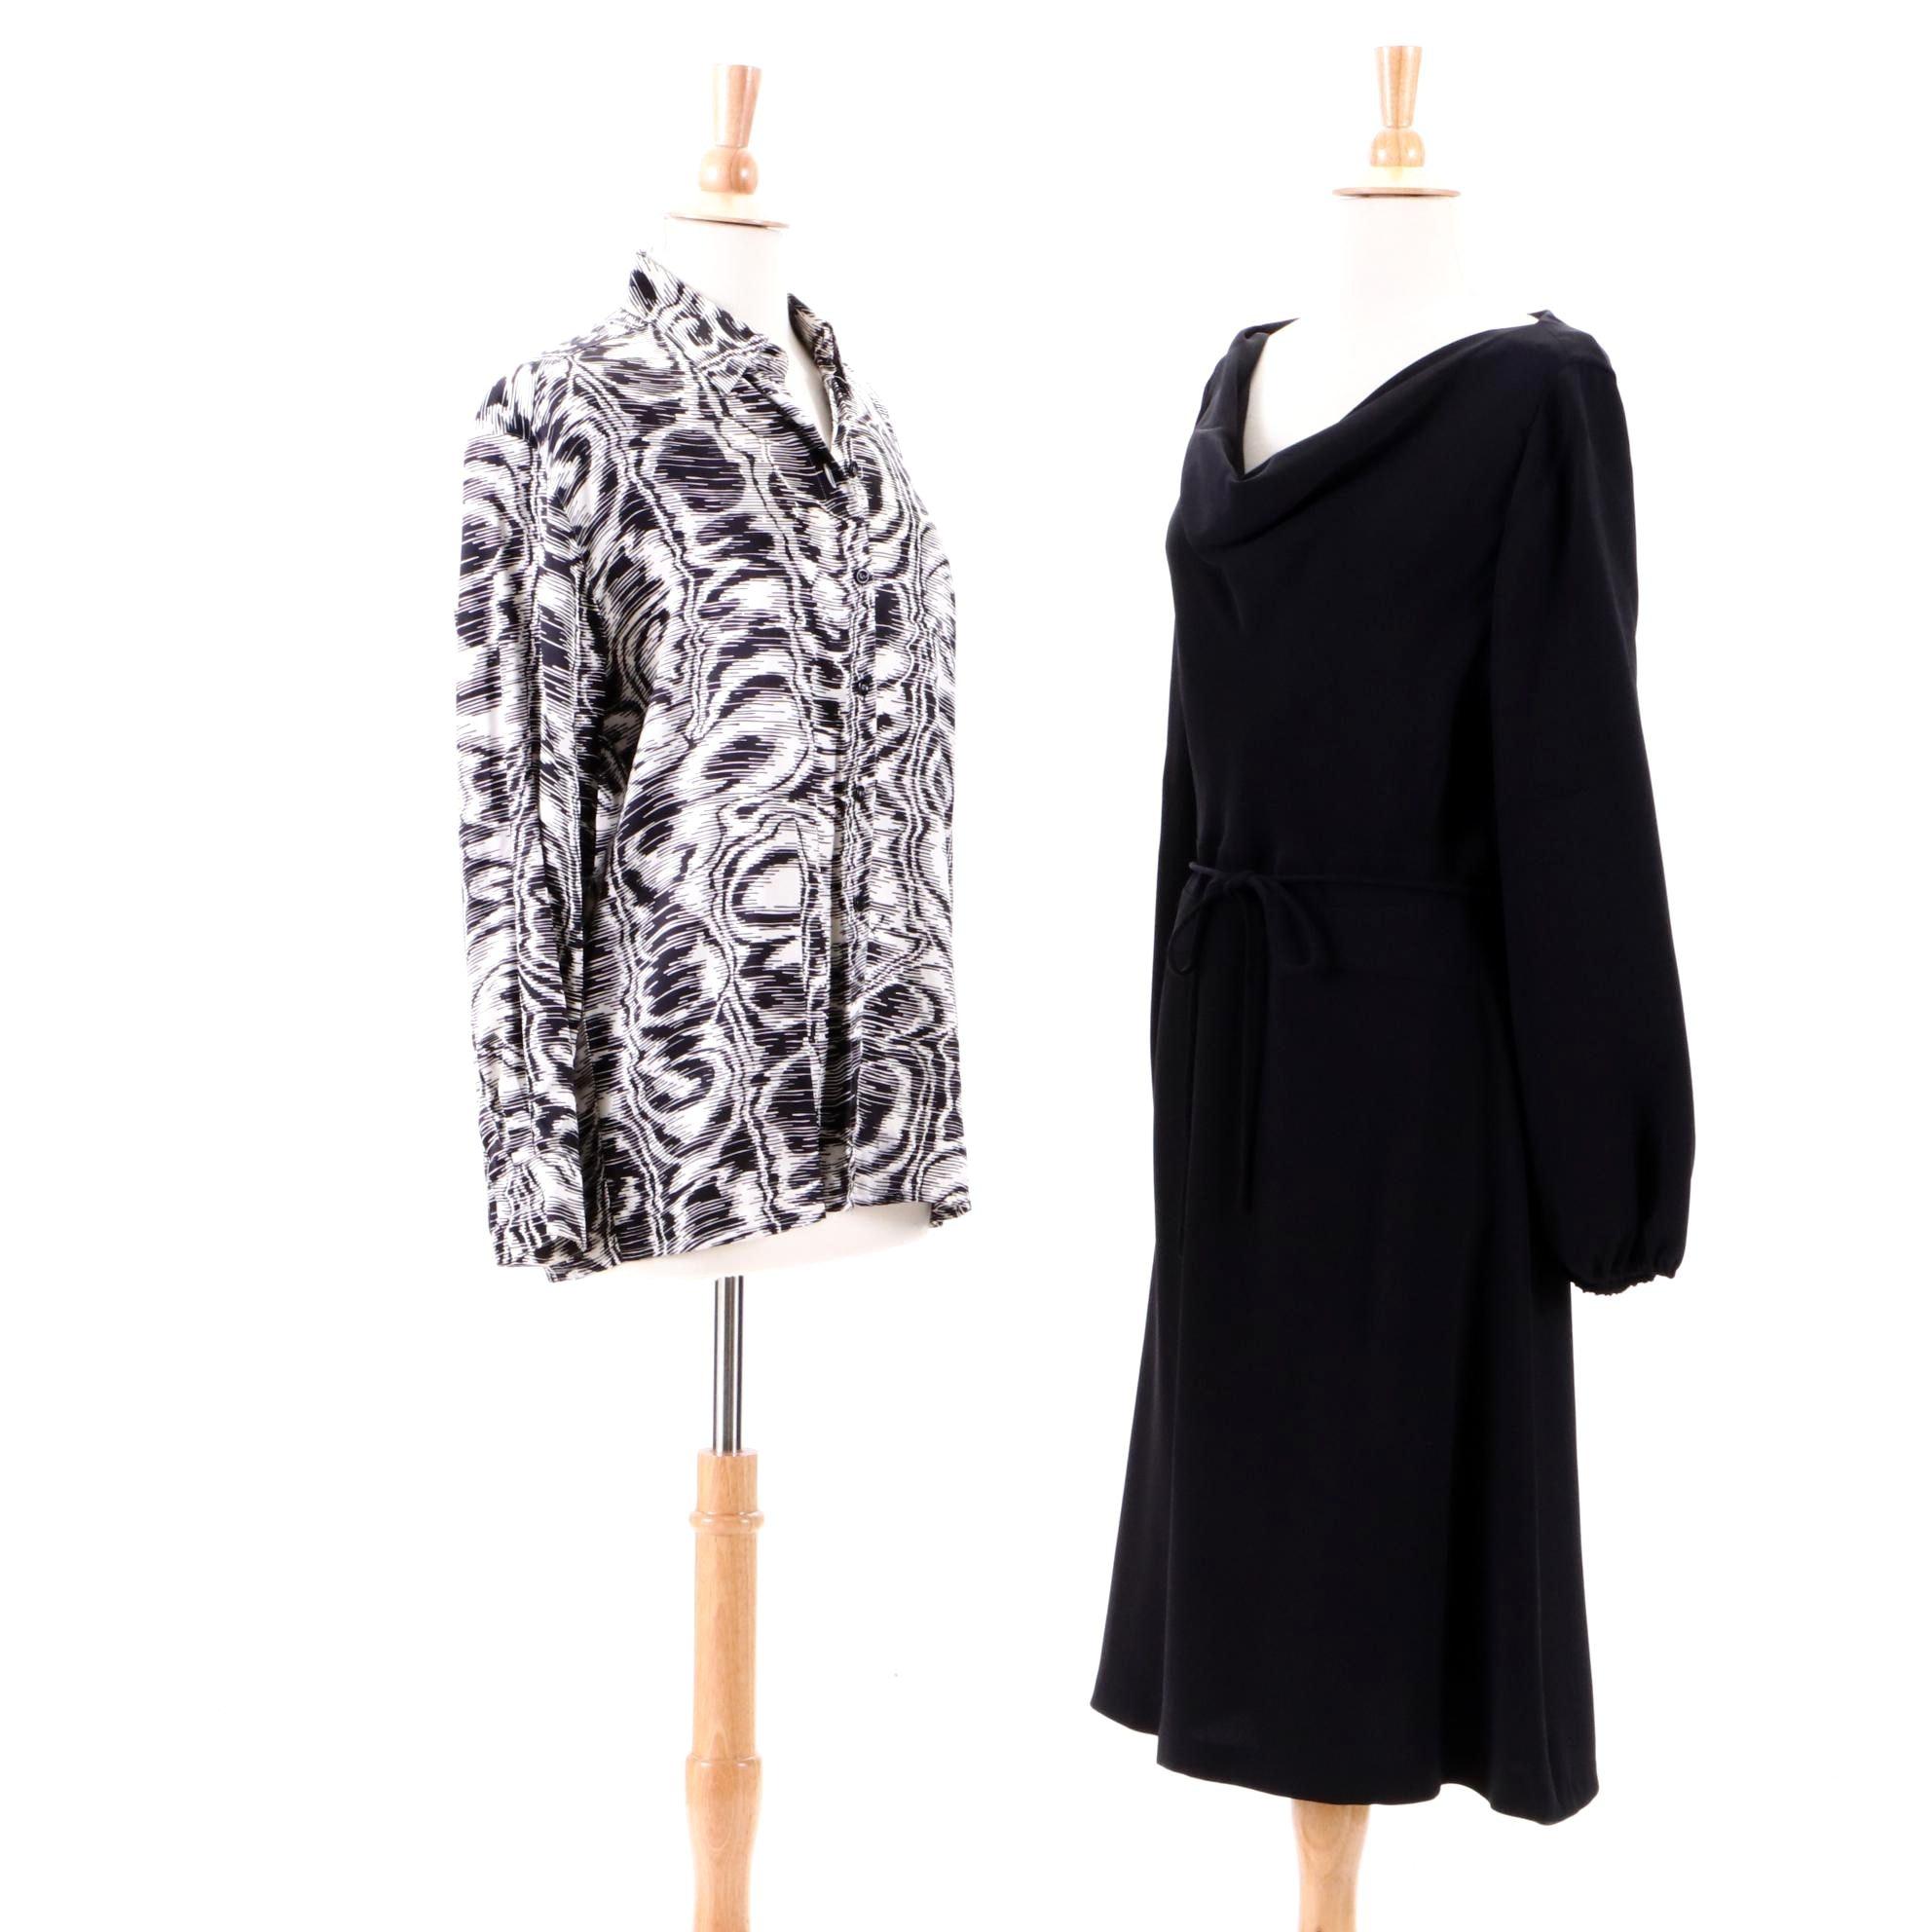 Escada Silk Blouse and Black Dress